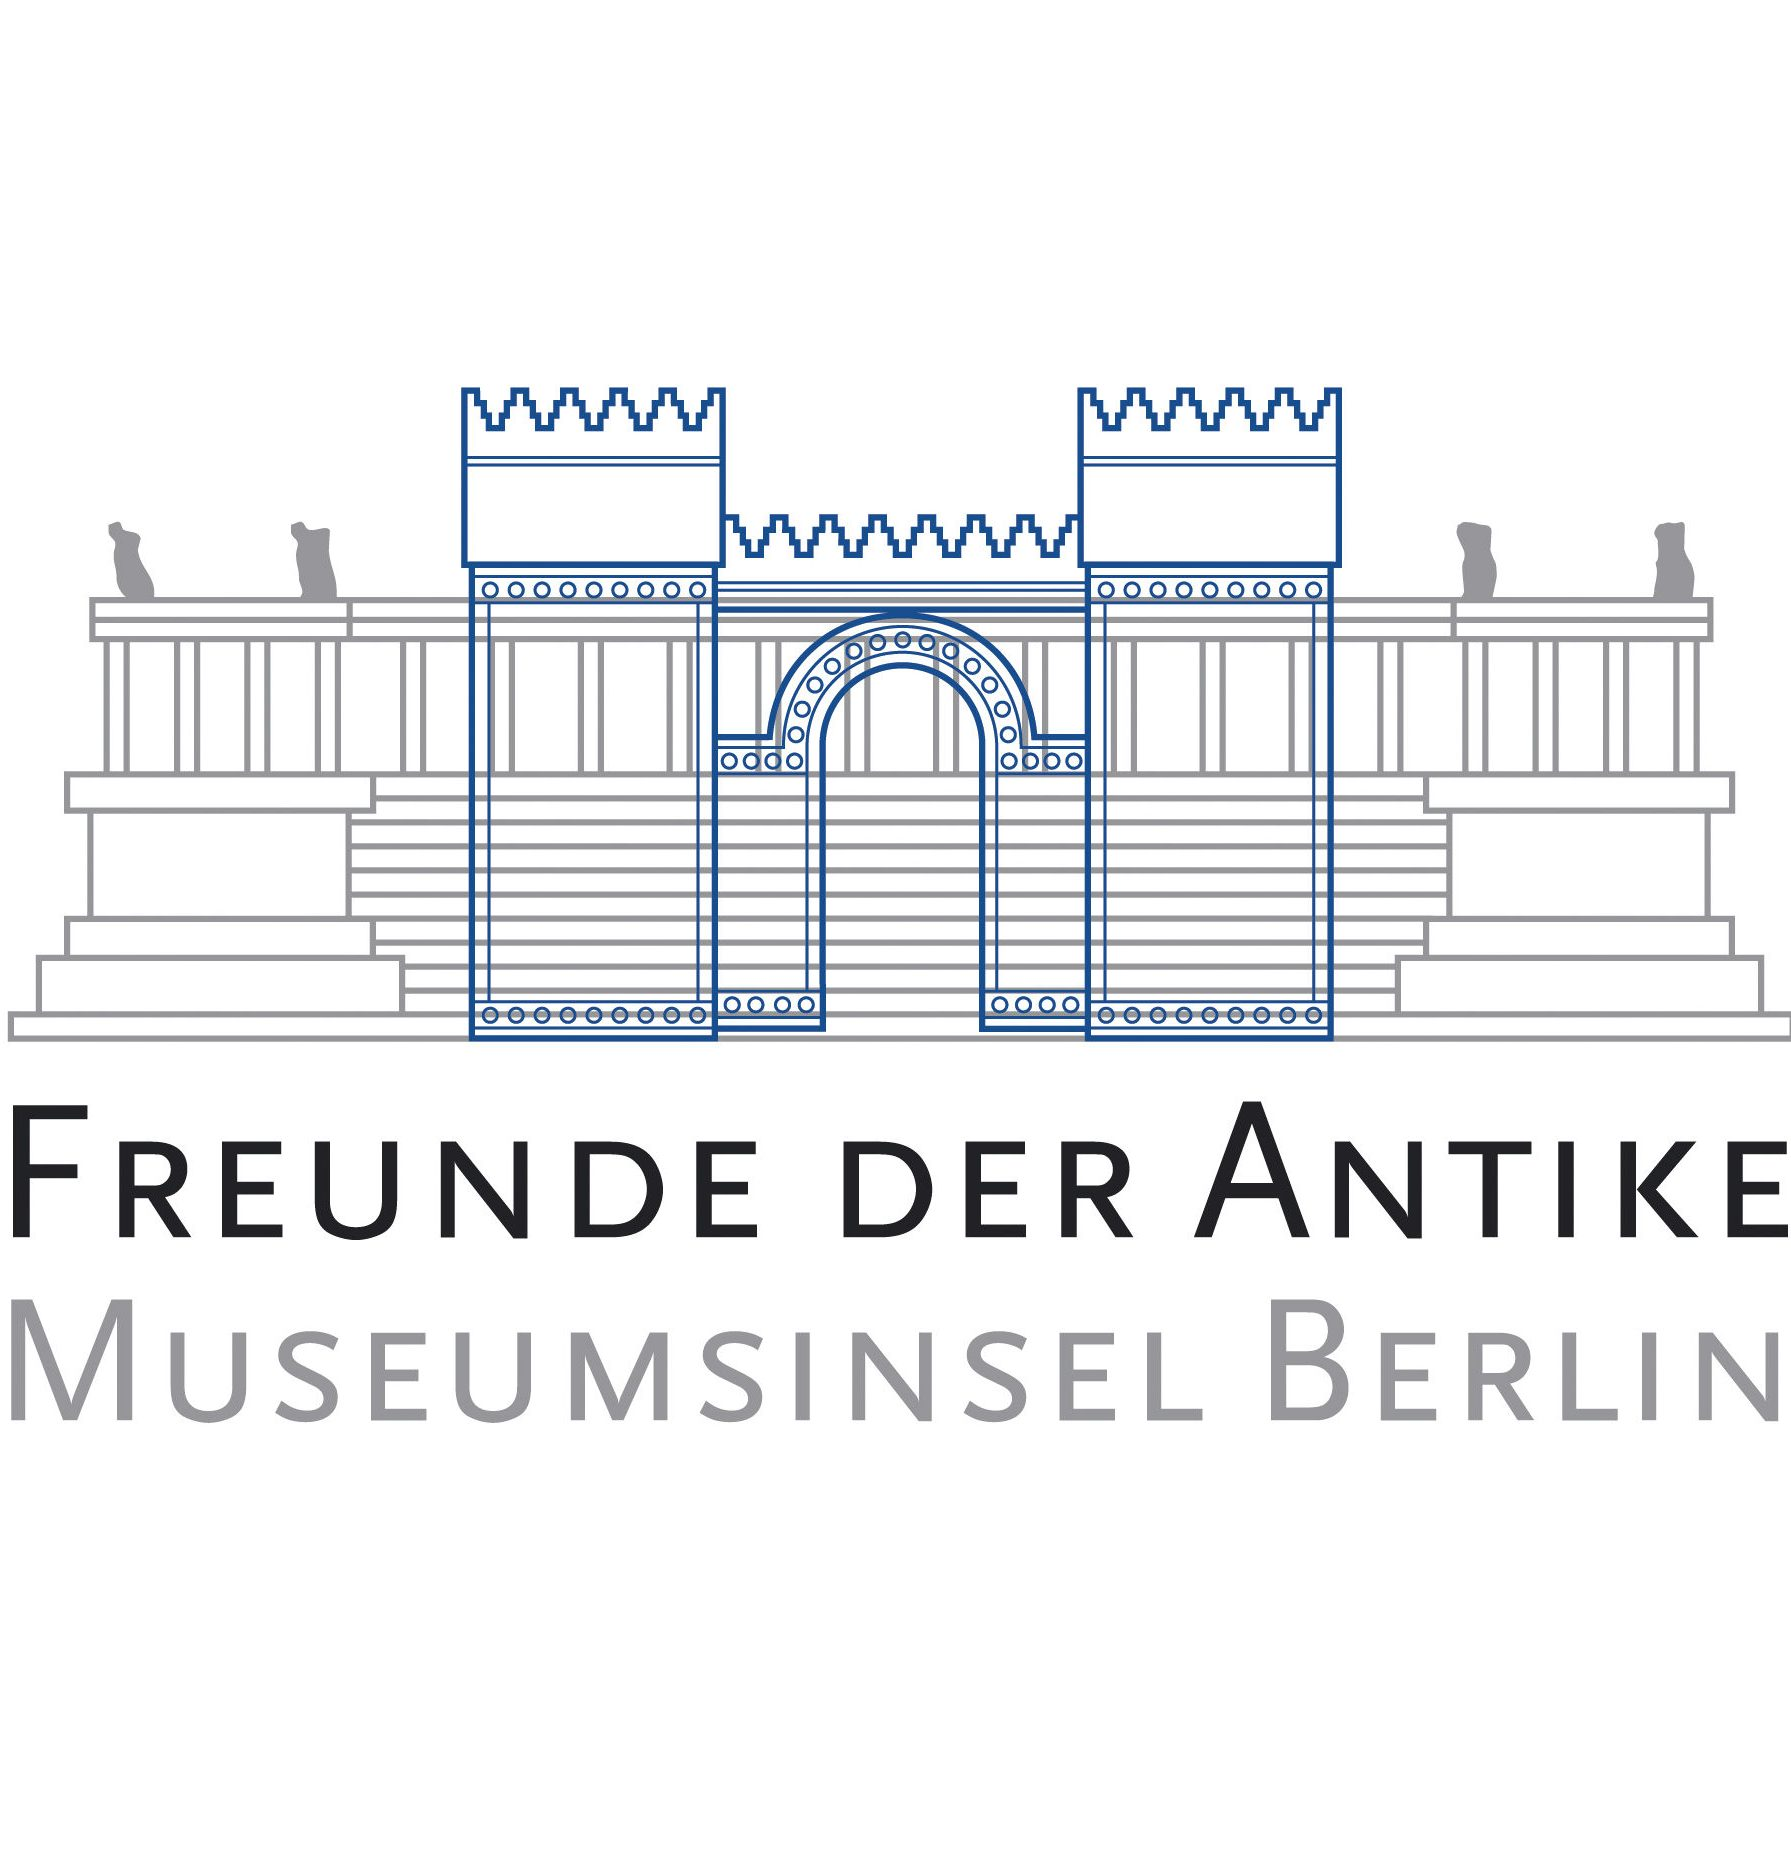 Freunde der Antike auf der Museumsinsel Berlin e. V.